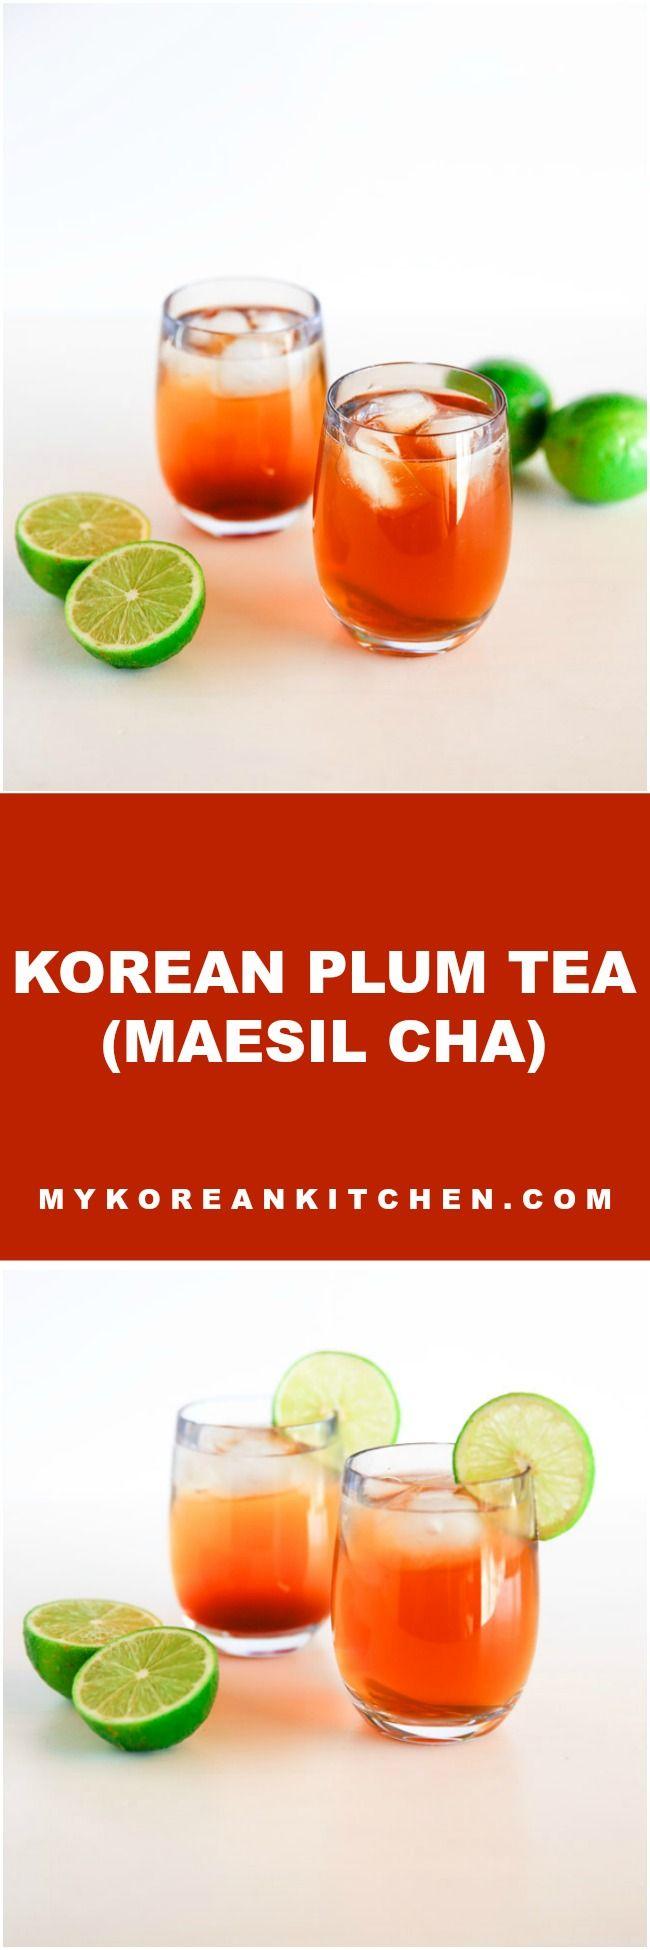 How to Make Korean Plum Tea (Maesil Cha) | MyKoreanKitchen.com